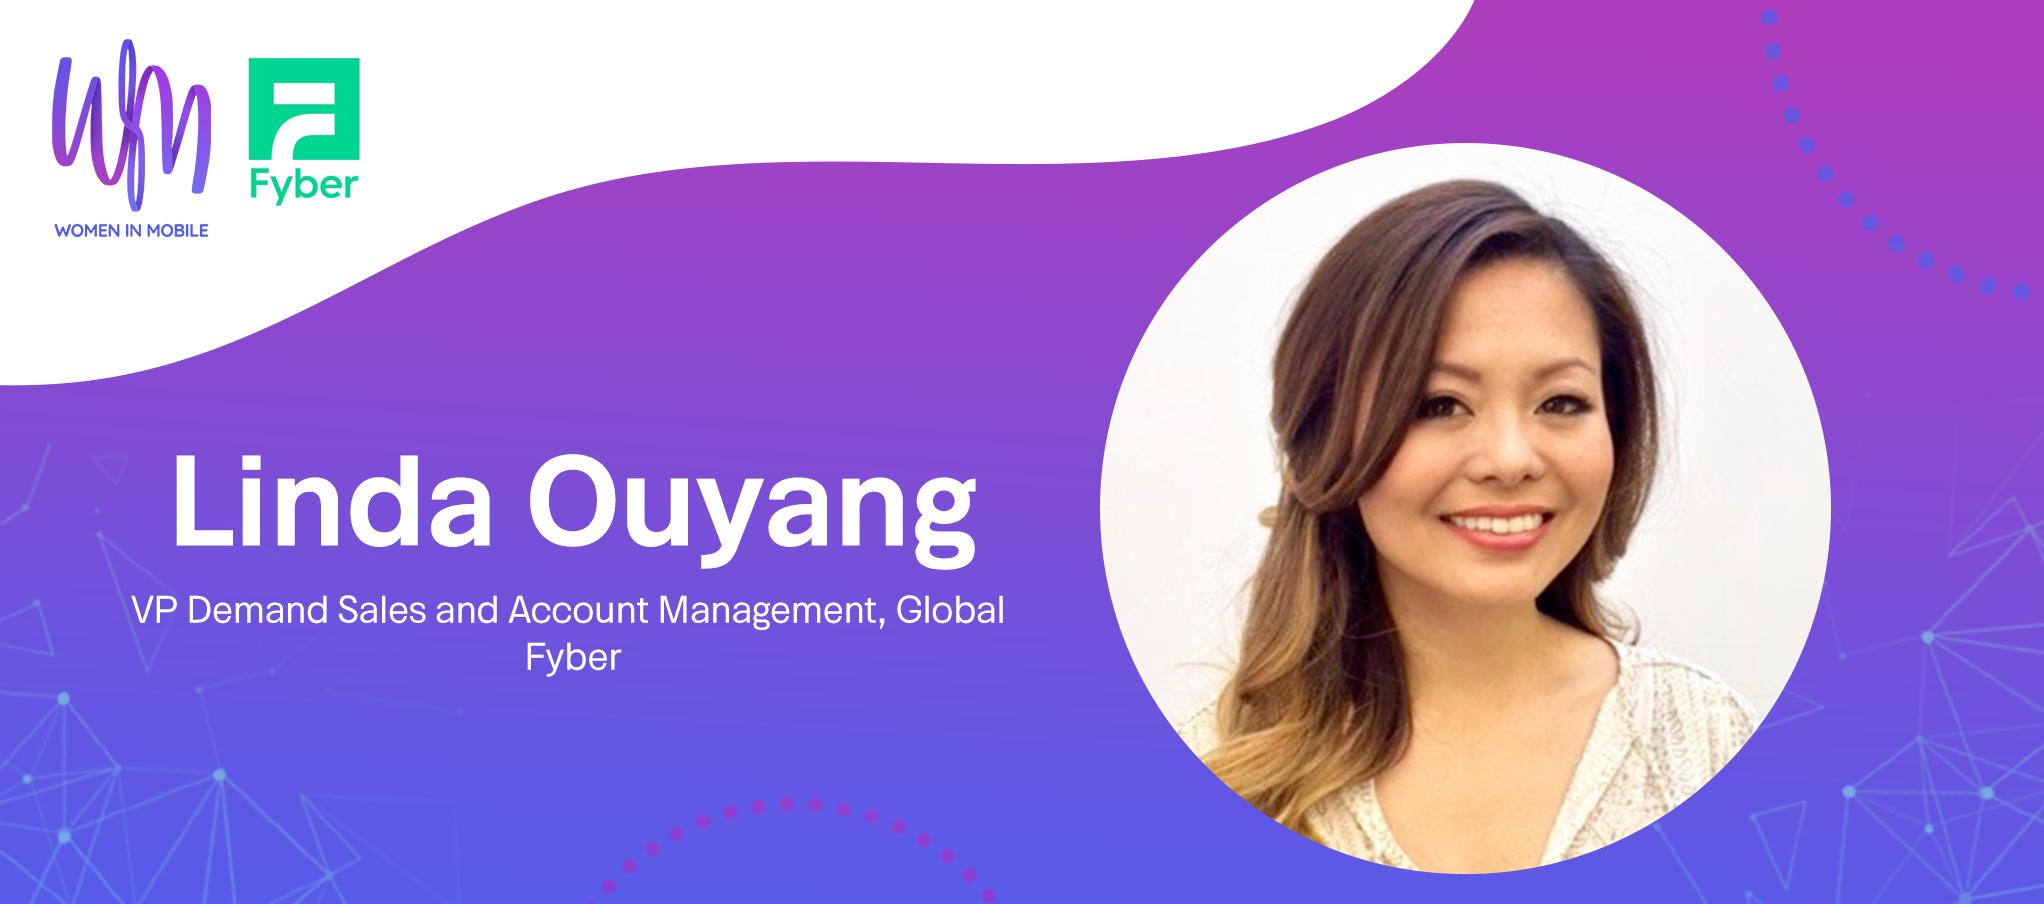 Linda Ouyang, VP Demand Sales and Account Management, Global at Fyber, at Aarki's Women in Mobile Series